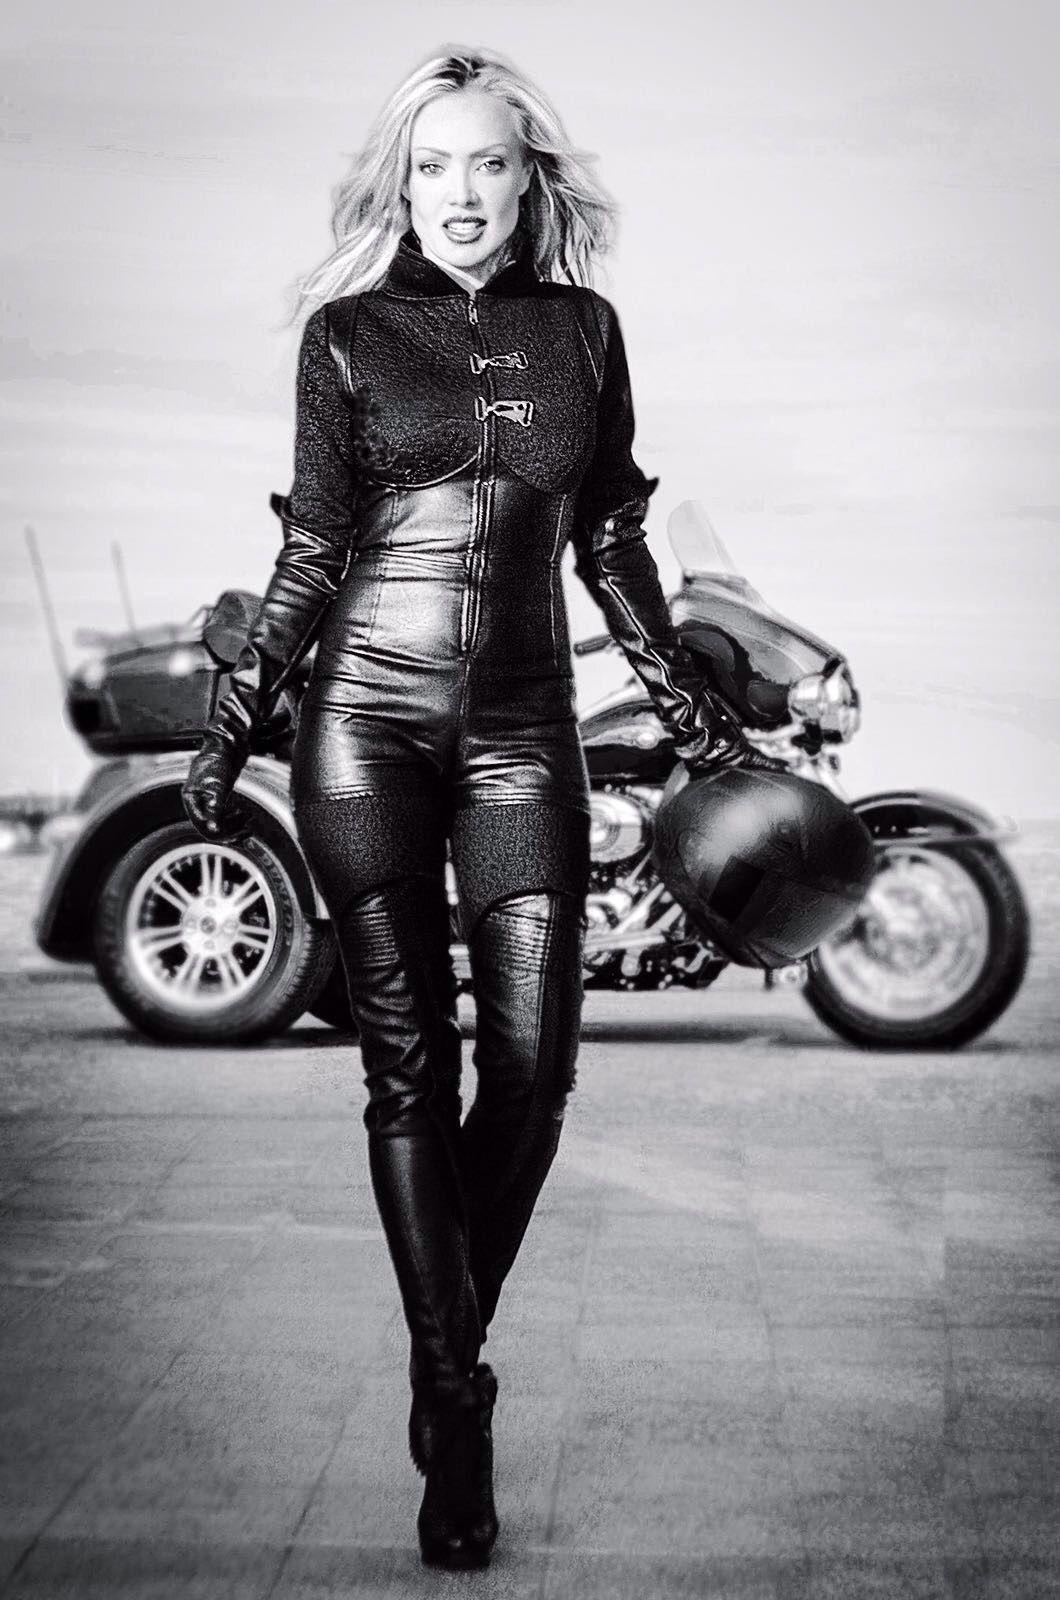 Lady Biker Biker Girl Biker Chick Girl Motorcycle Cafe Racer Girl